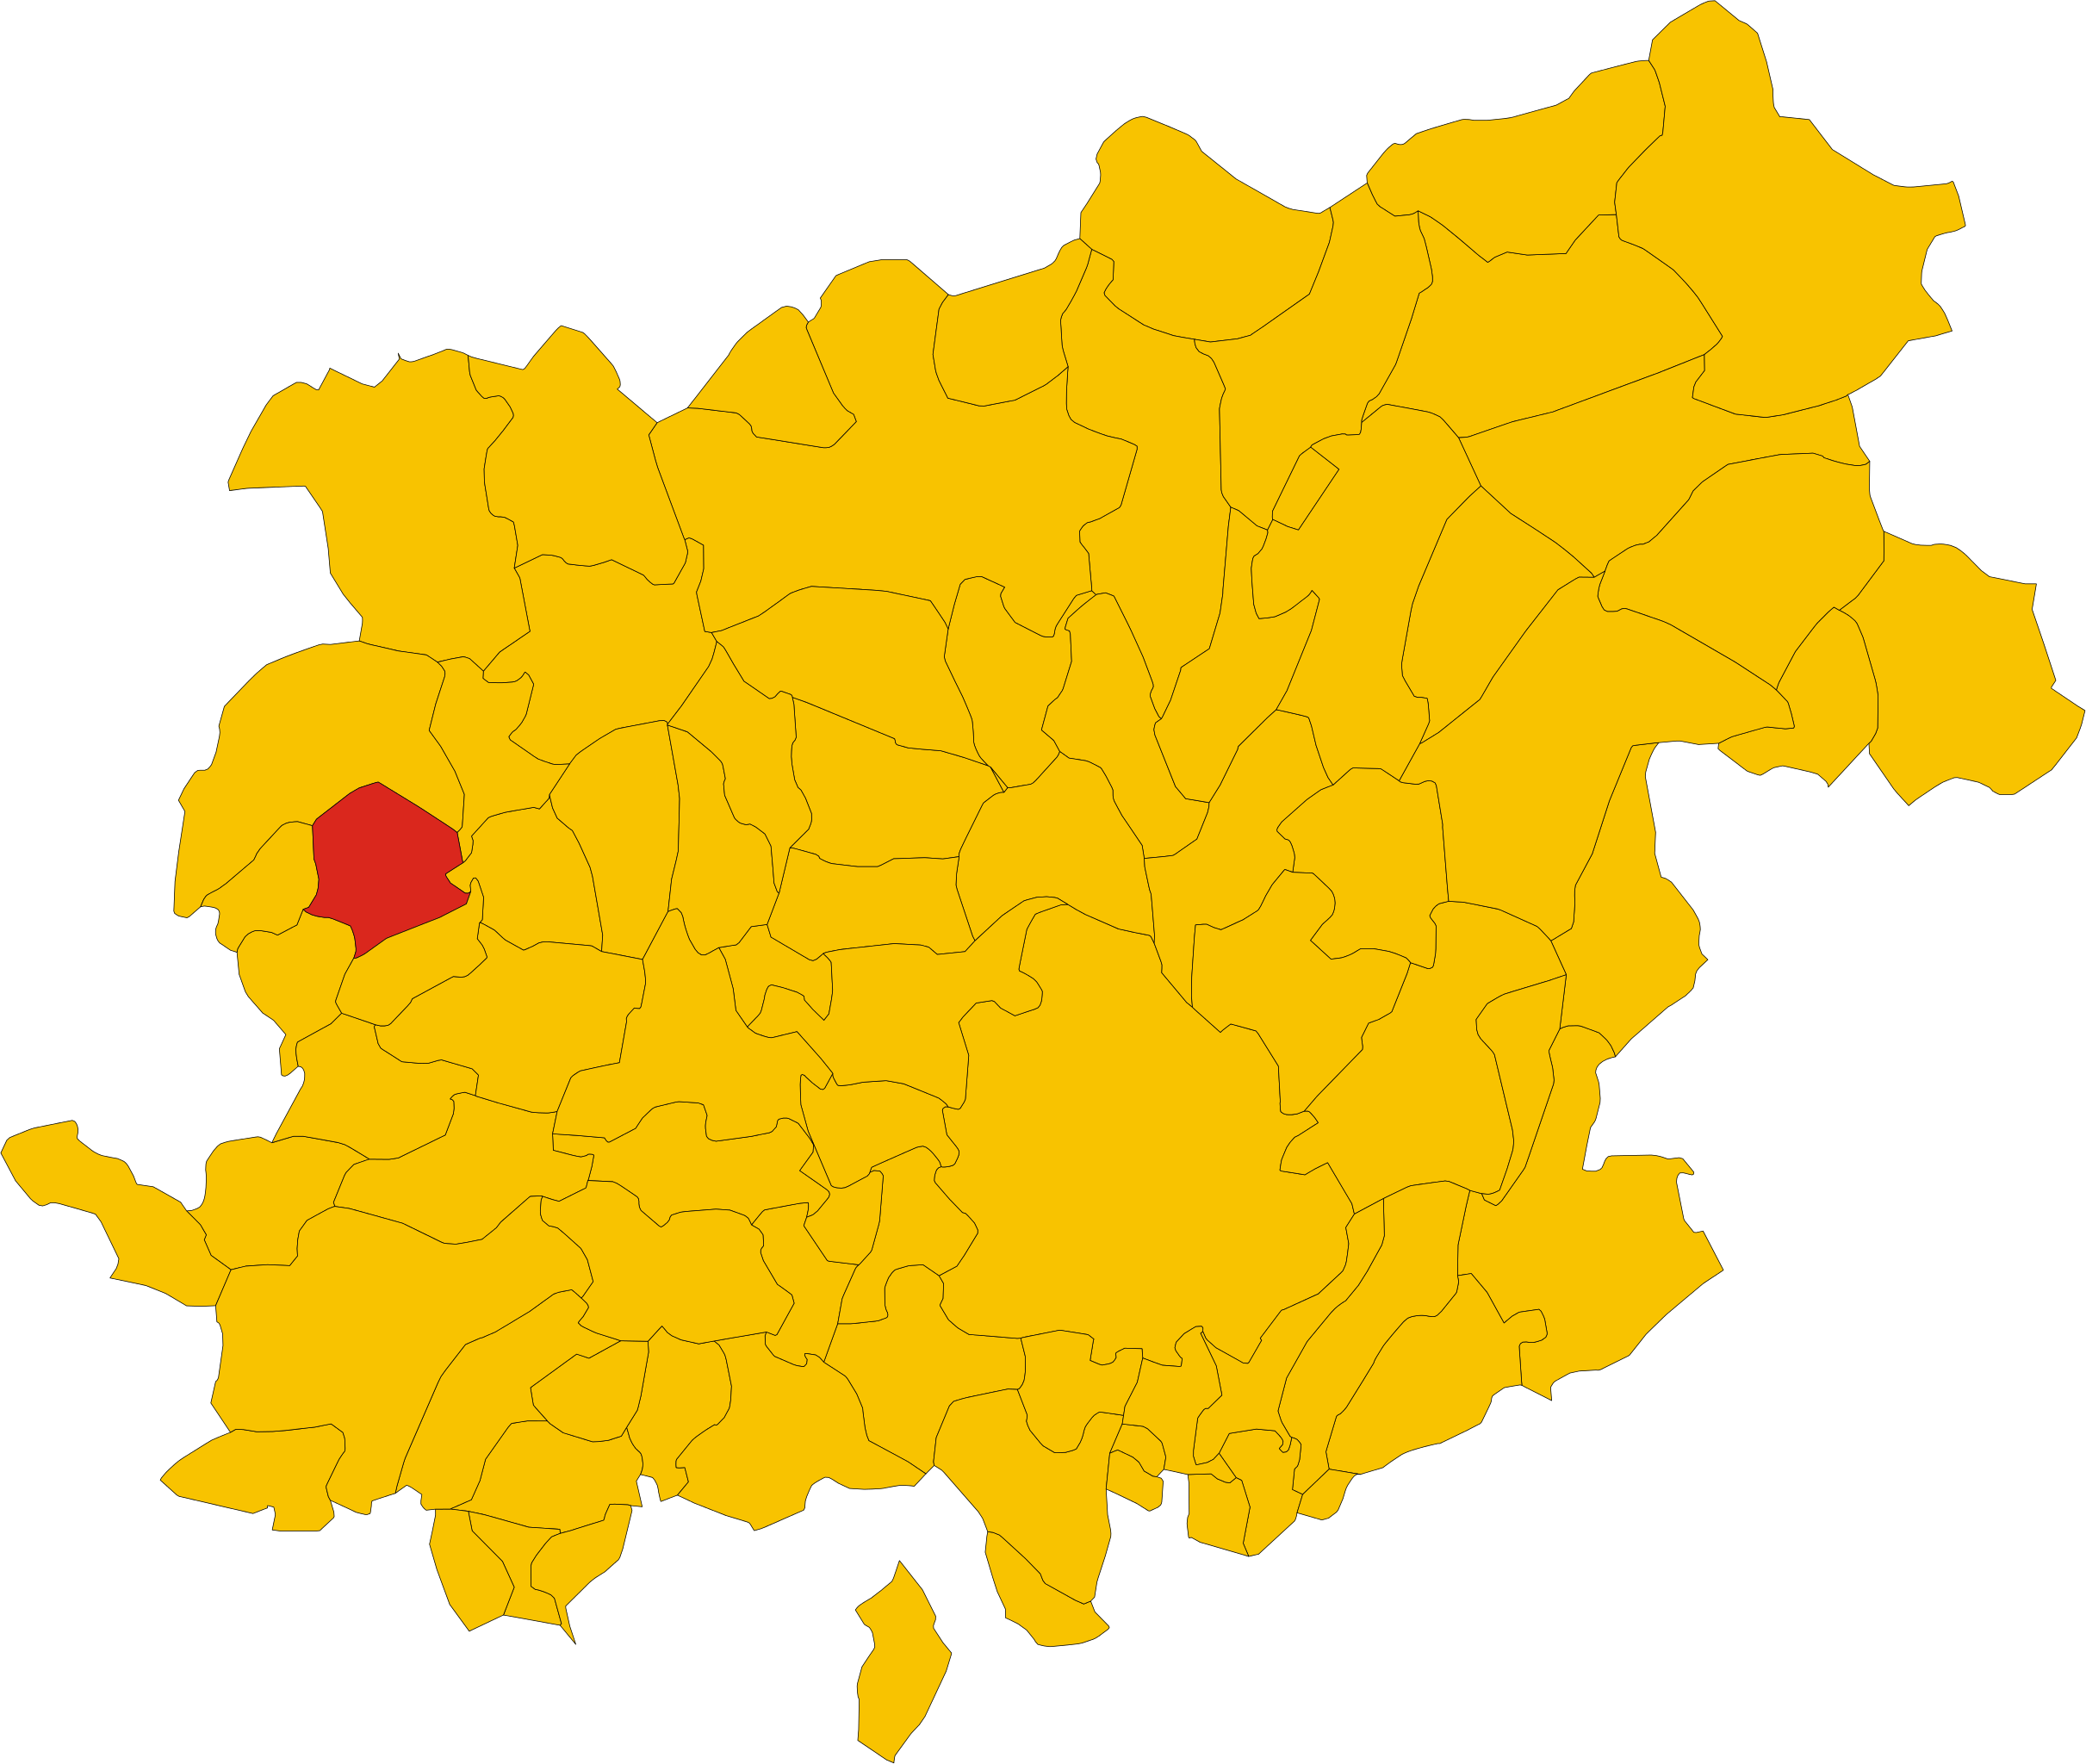 File:Map of comune of San Salvatore Telesino (province of.